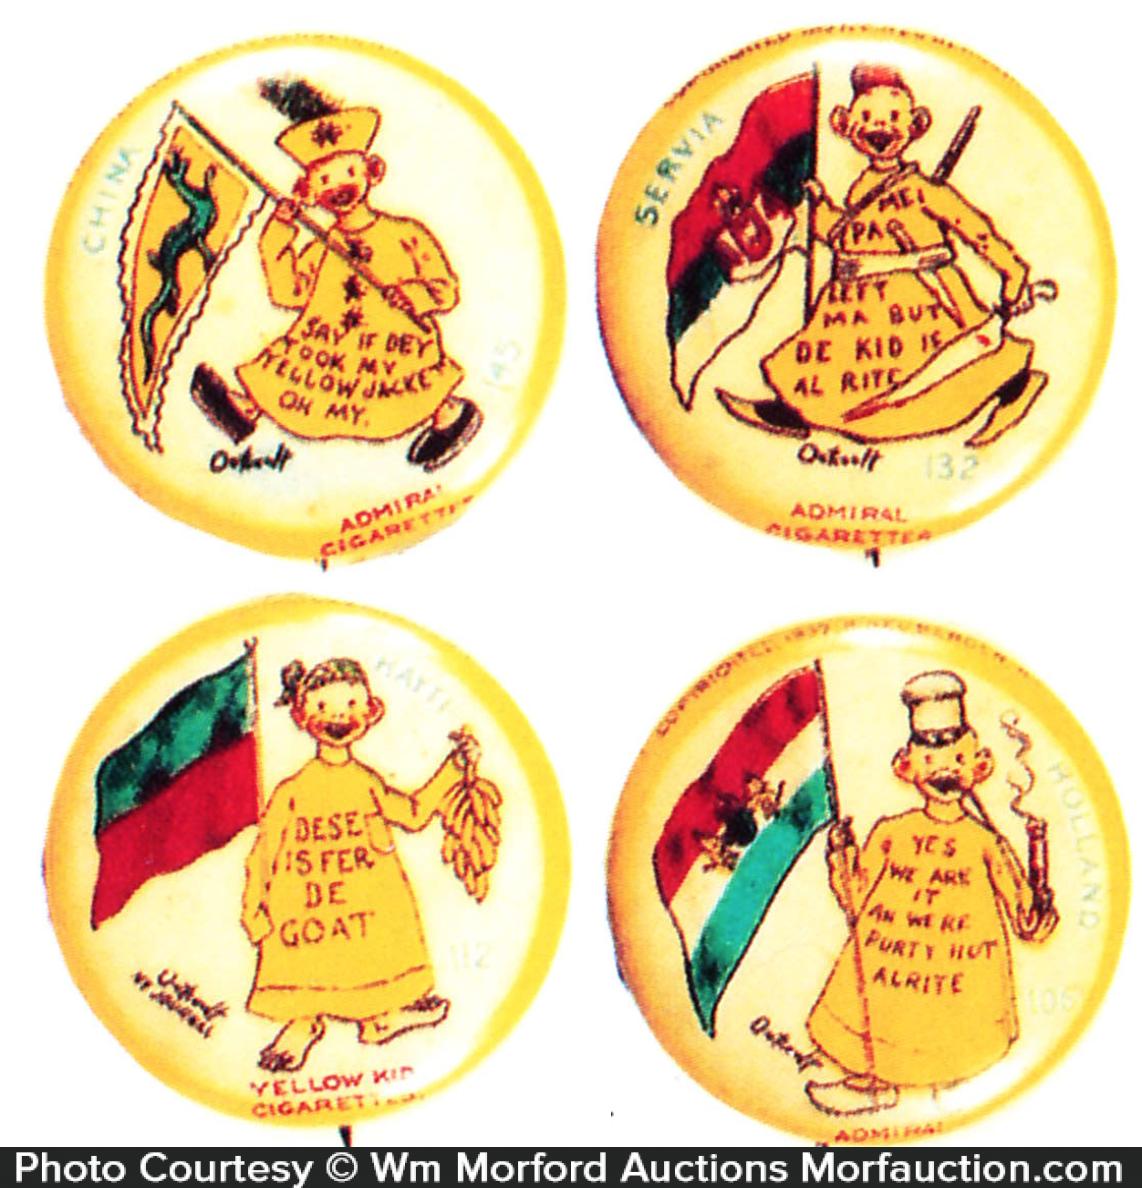 Yellow Kid Admiral Cigarettes Pins